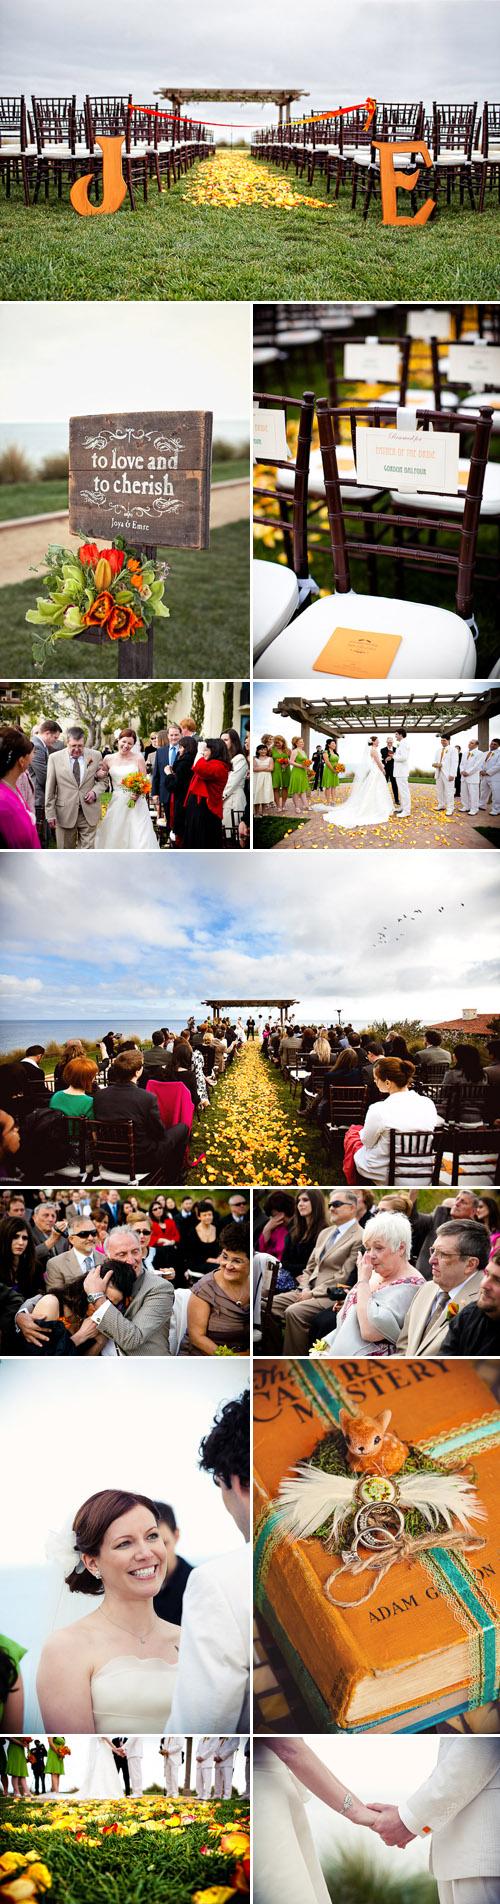 wedding style joya and emre and their wedding music